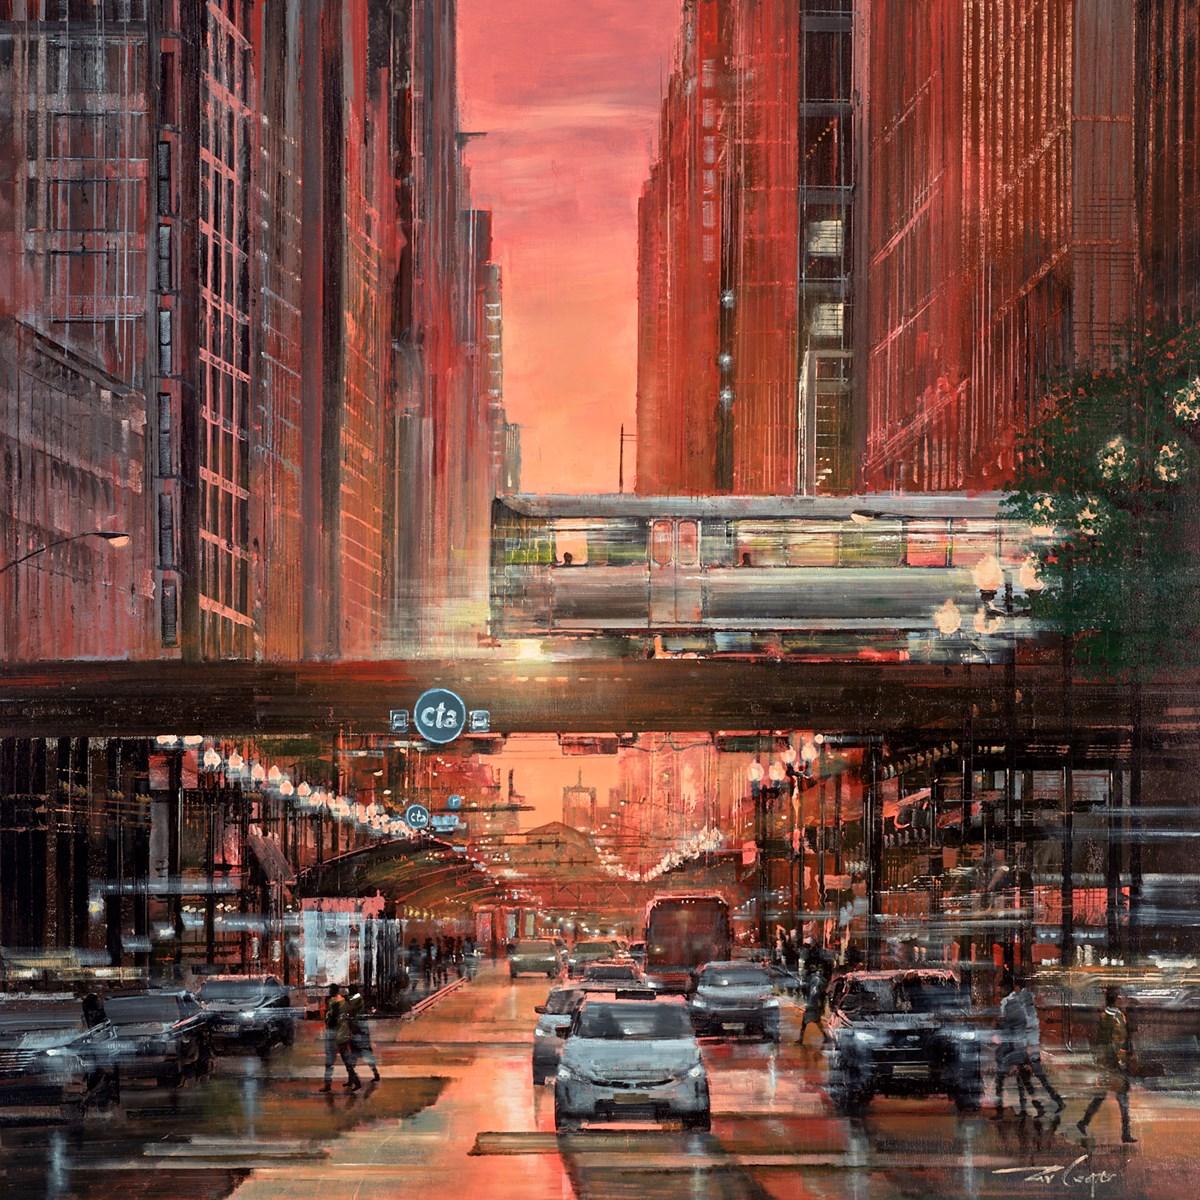 Riding into the Sunset (Randolph Street Chicago)